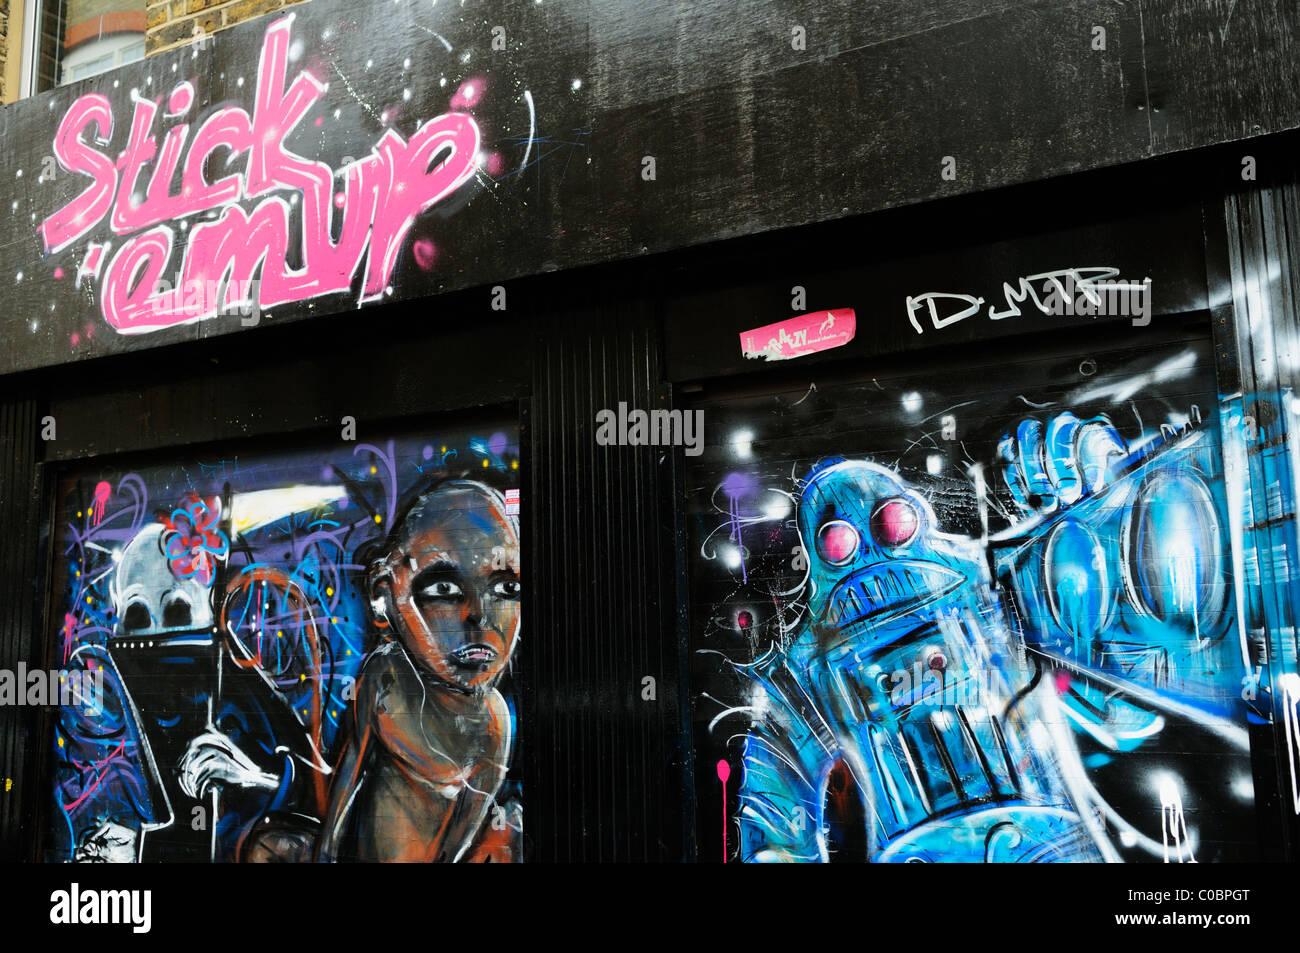 Stick 'em Up Shopfront Graffiti, off Brick Lane, London, England, Uk - Stock Image